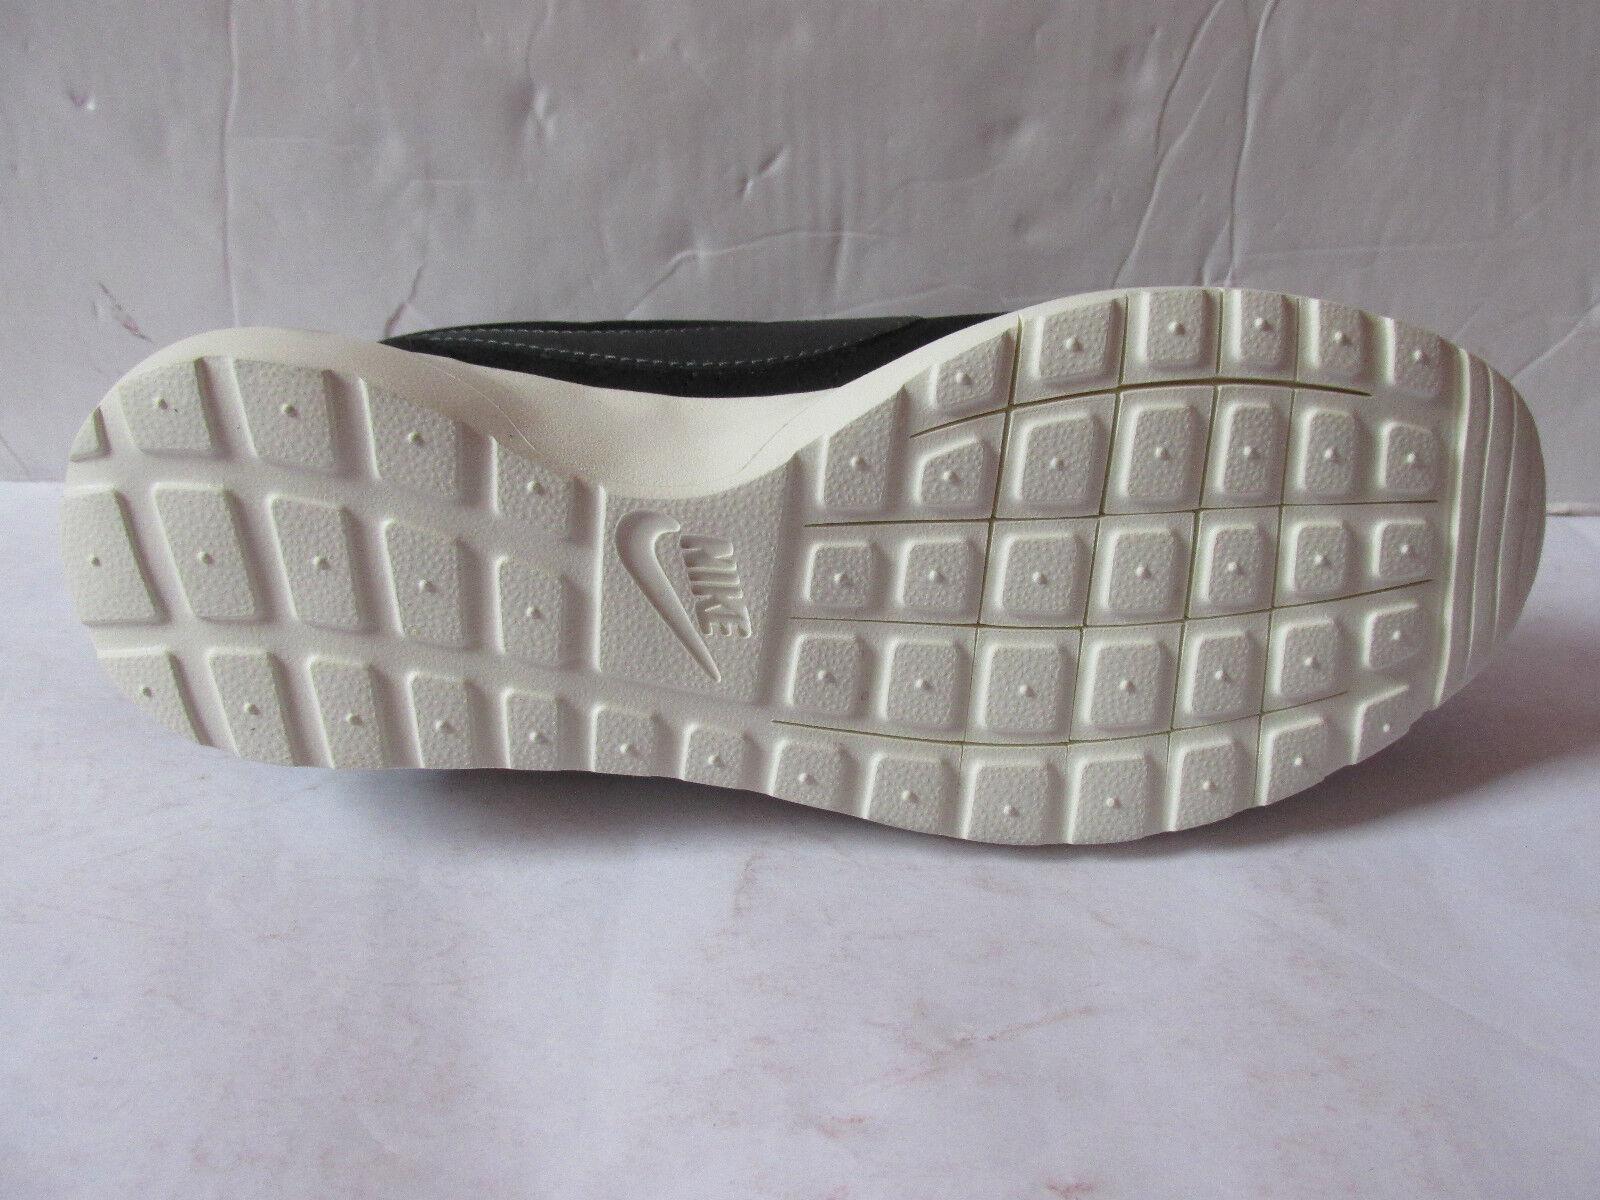 Nike Damenss 002 roshe LD-1000 trainers 819843 002 Damenss Turnschuhe schuhe be6f7a